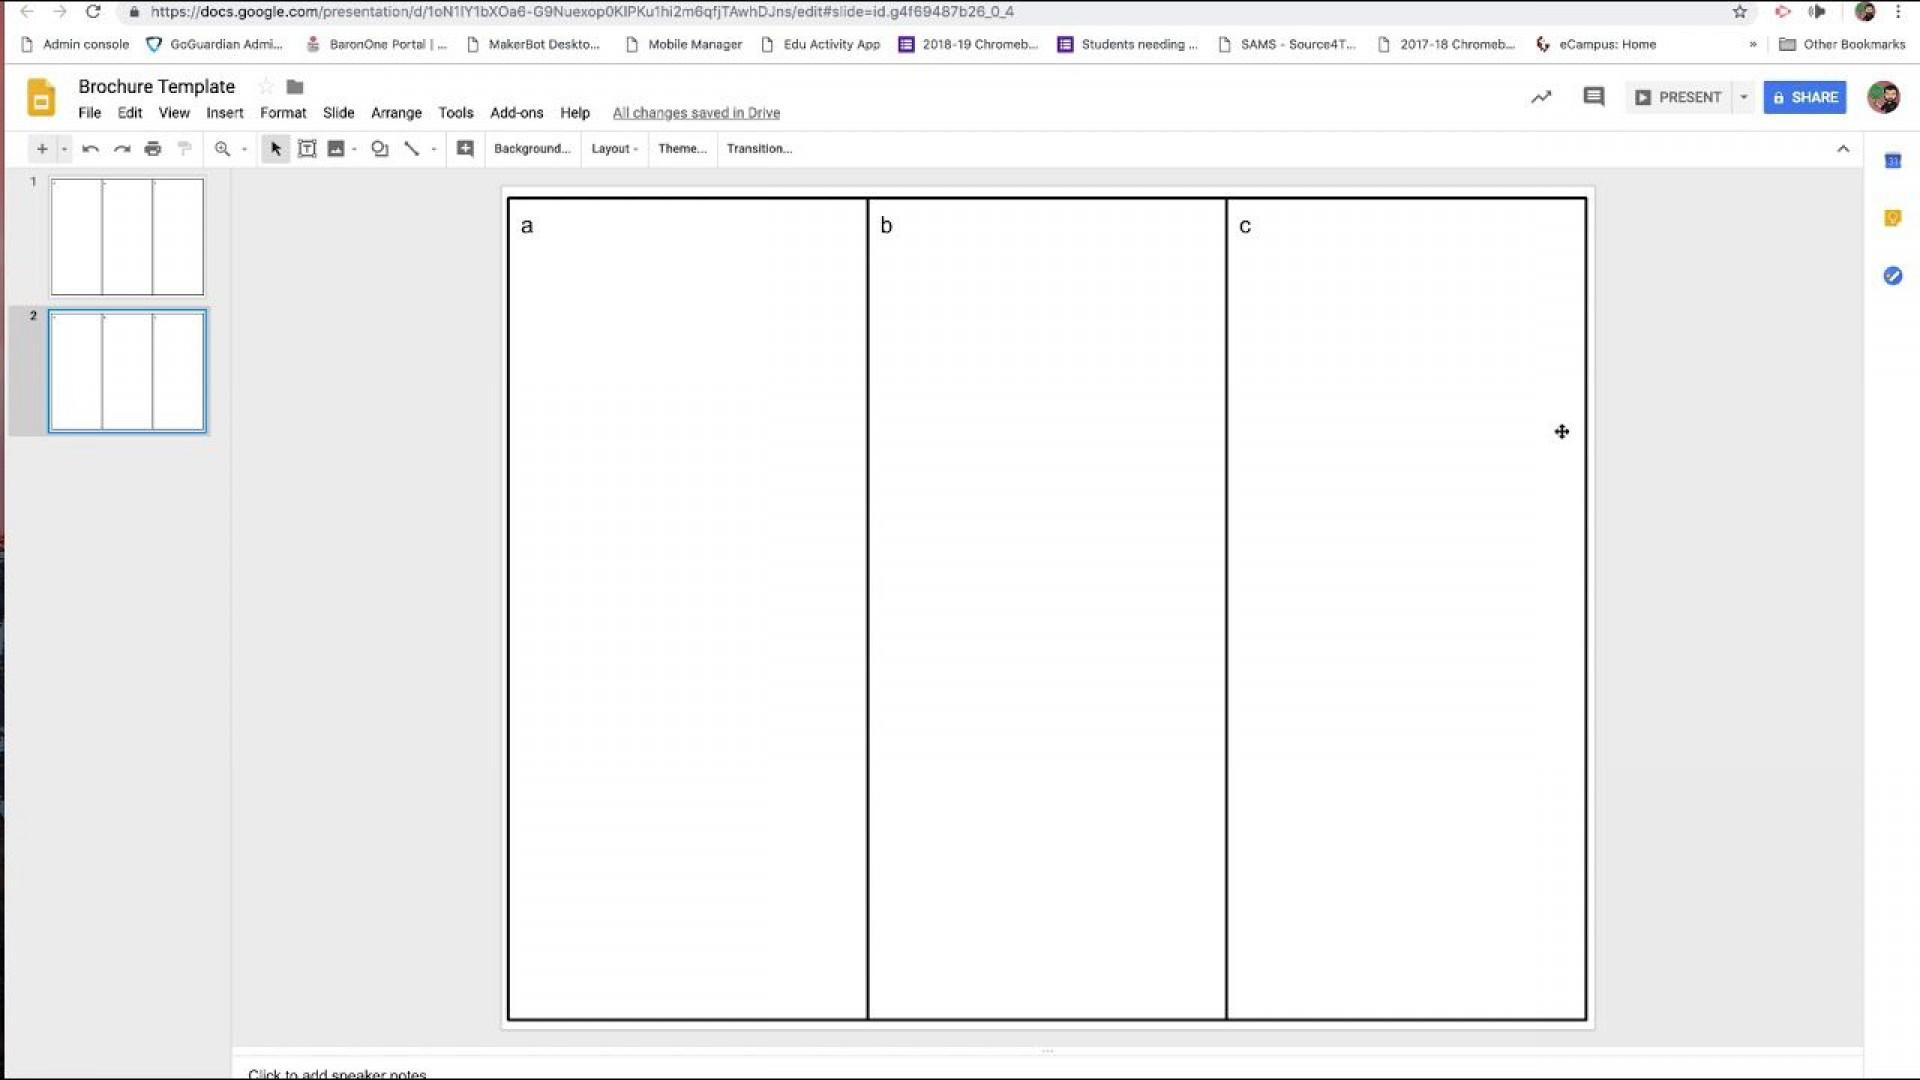 006 Frightening Brochure Template For Google Doc Design  Docs Download 3 Panel Free1920